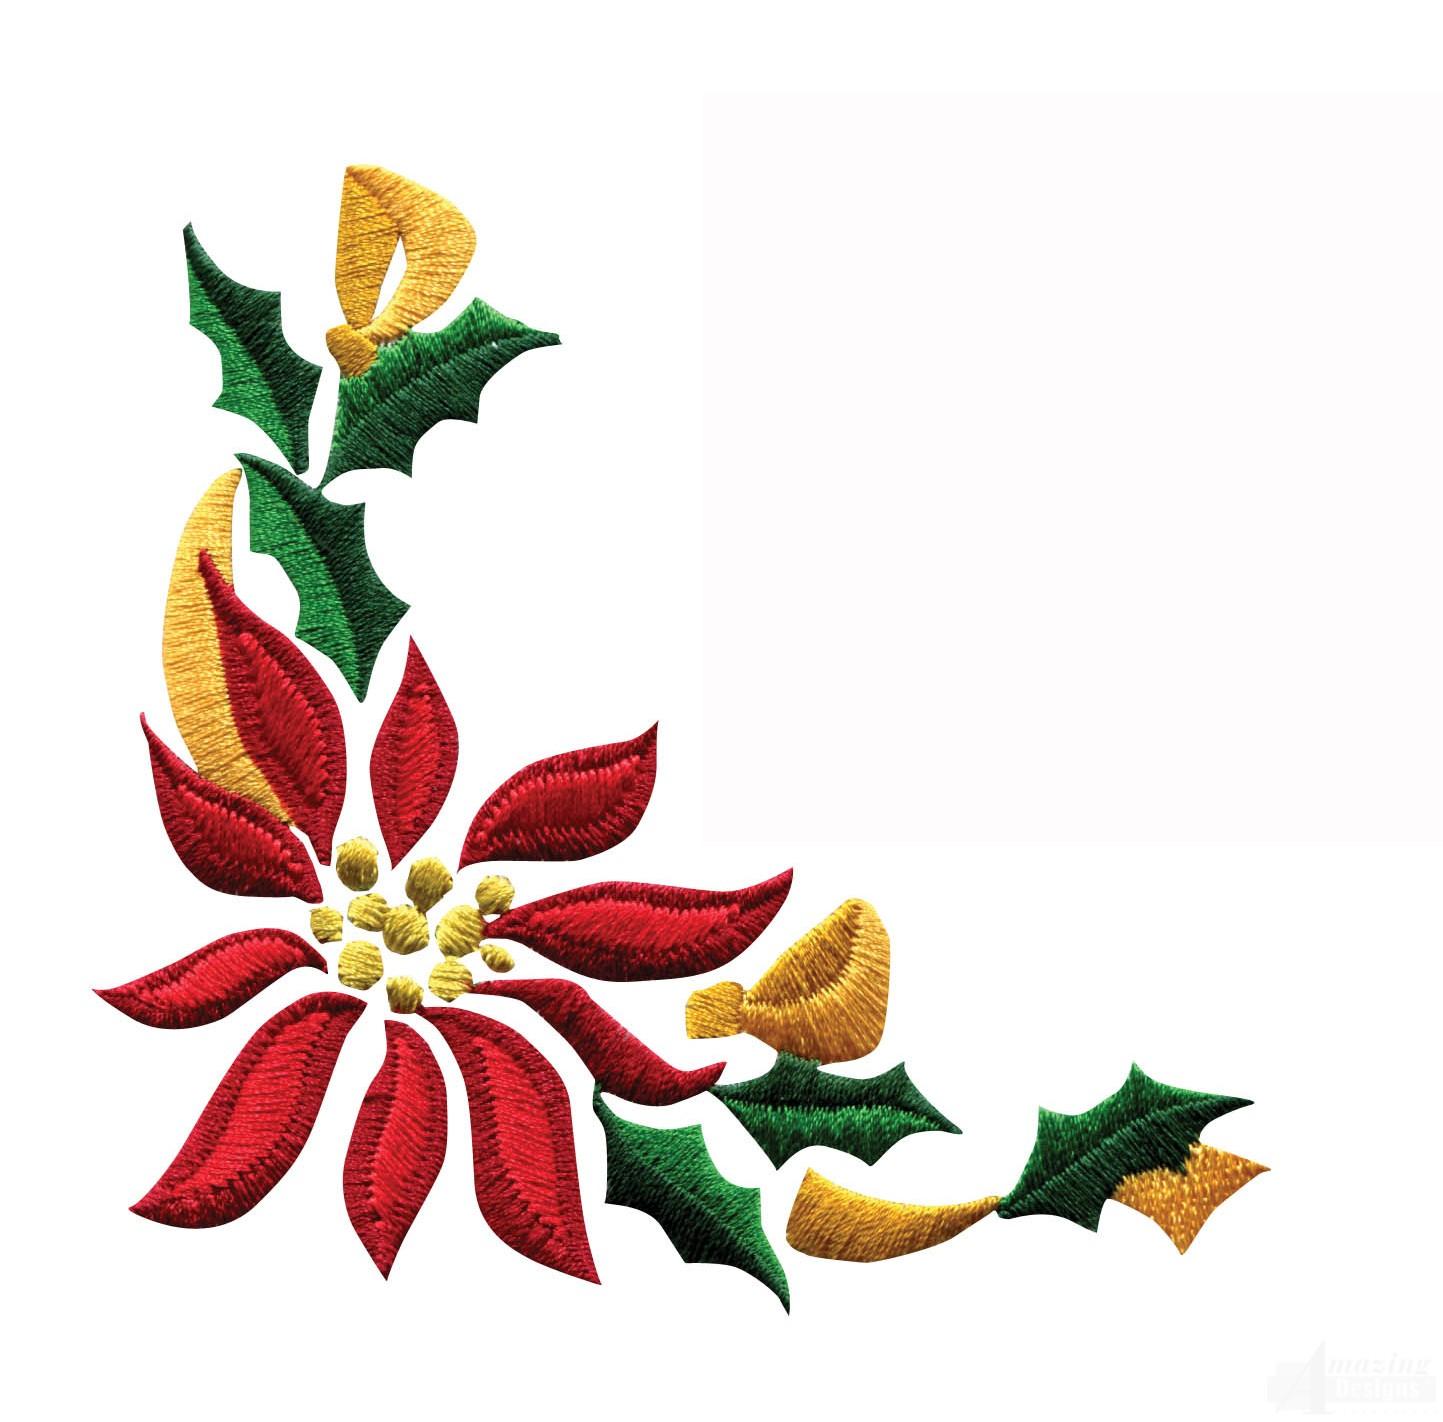 Poinsettia clipart horizontal flower border Border Poinsettia Designs 3 Embroidery